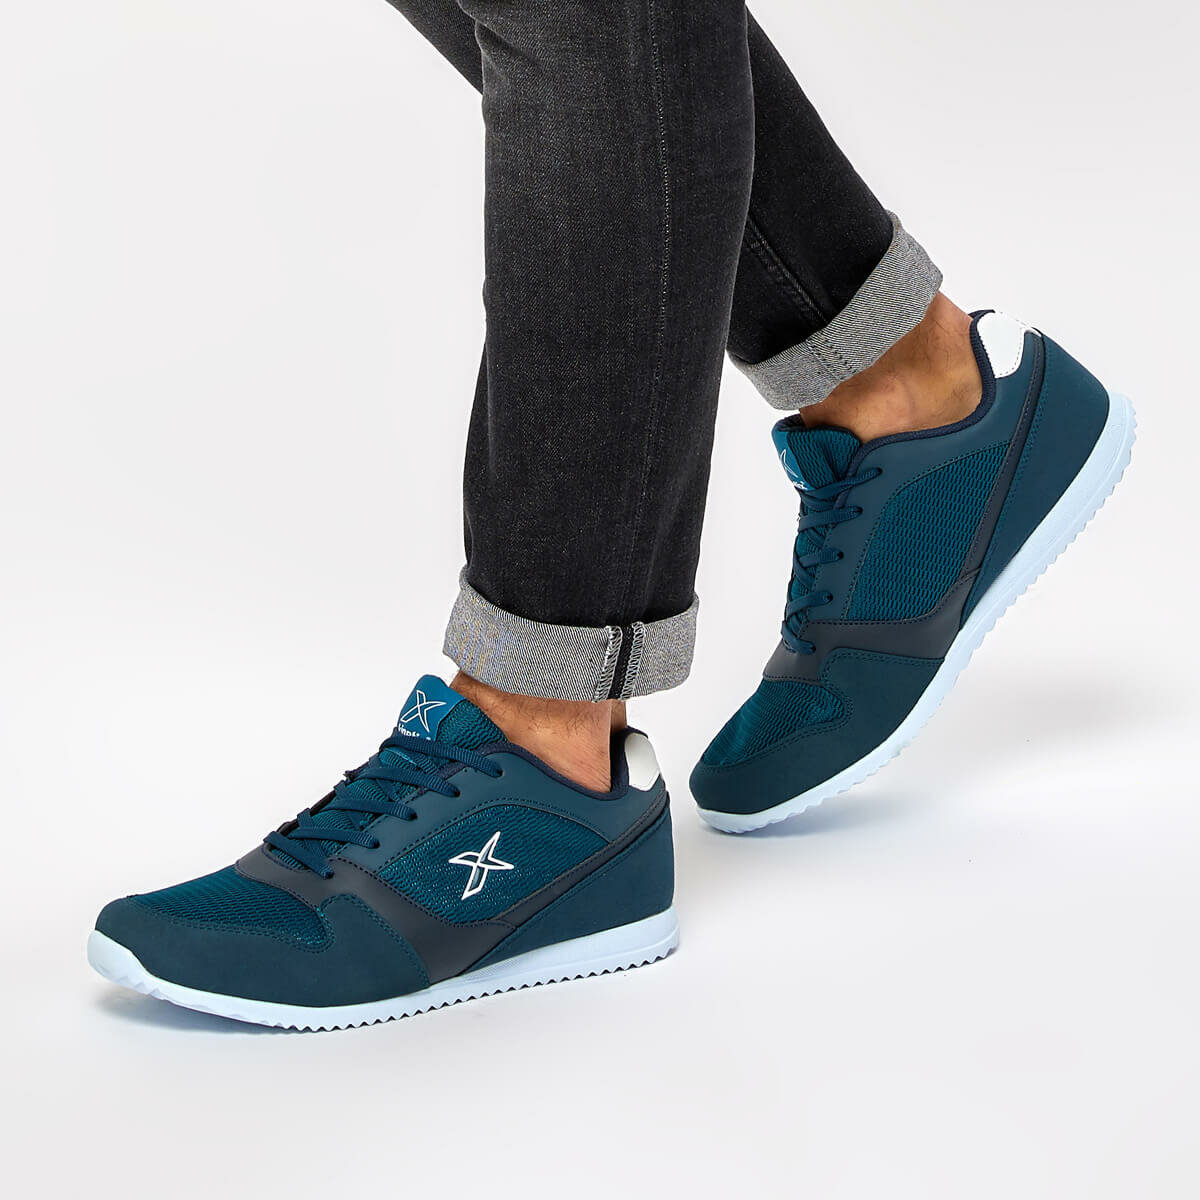 FLO ODELL M Gray Men 'S Sneaker Shoes KINETIX